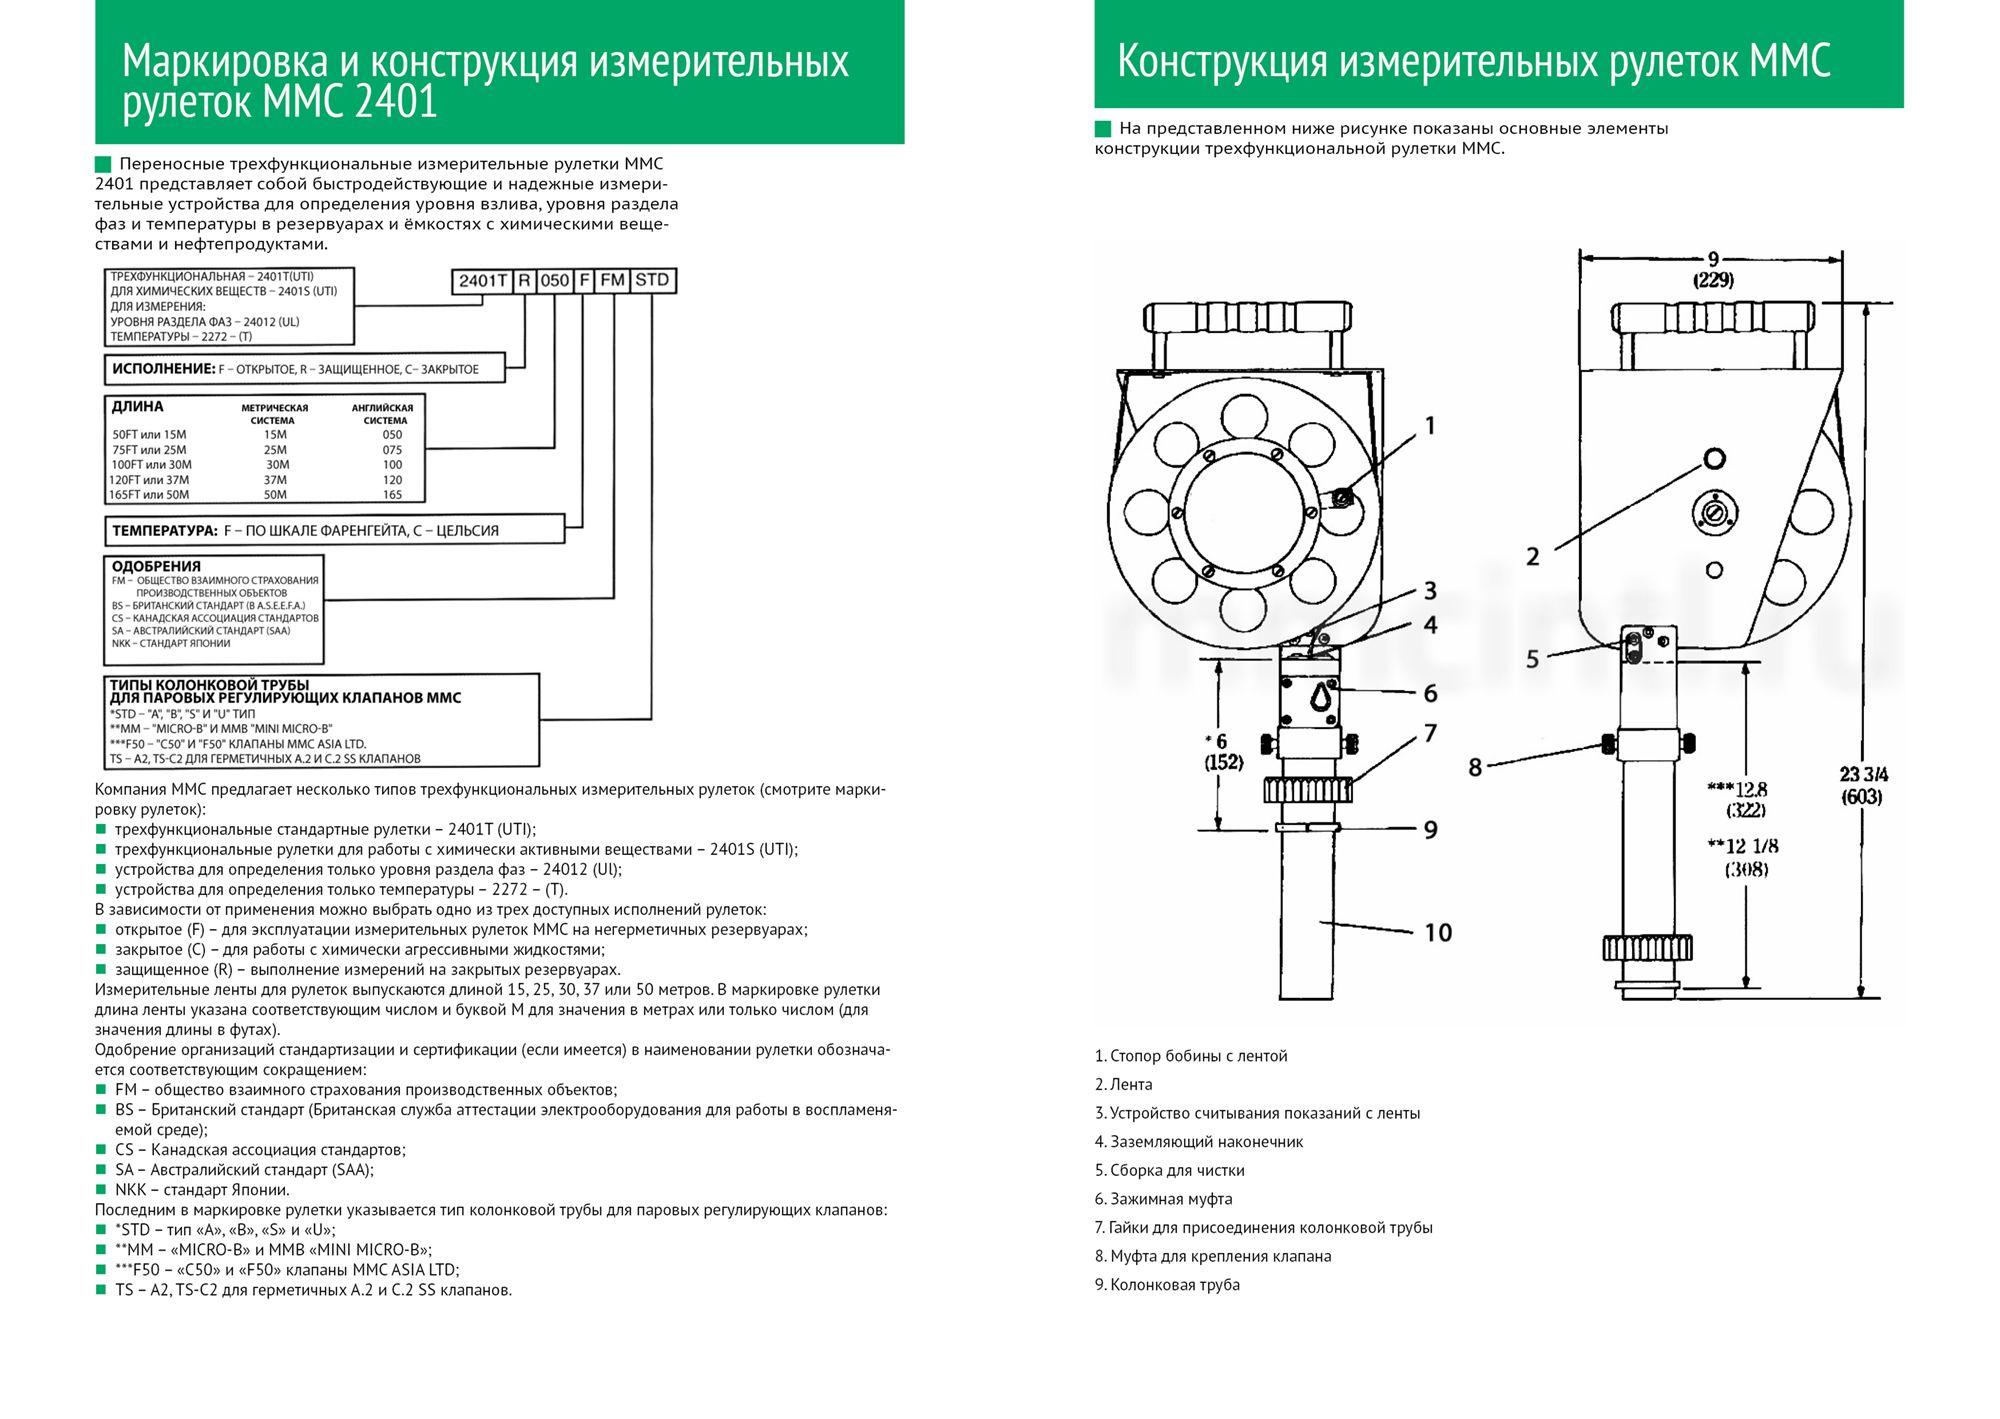 Дизайн брошюры/каталога (8-10 страниц) - дизайнер mit-sey